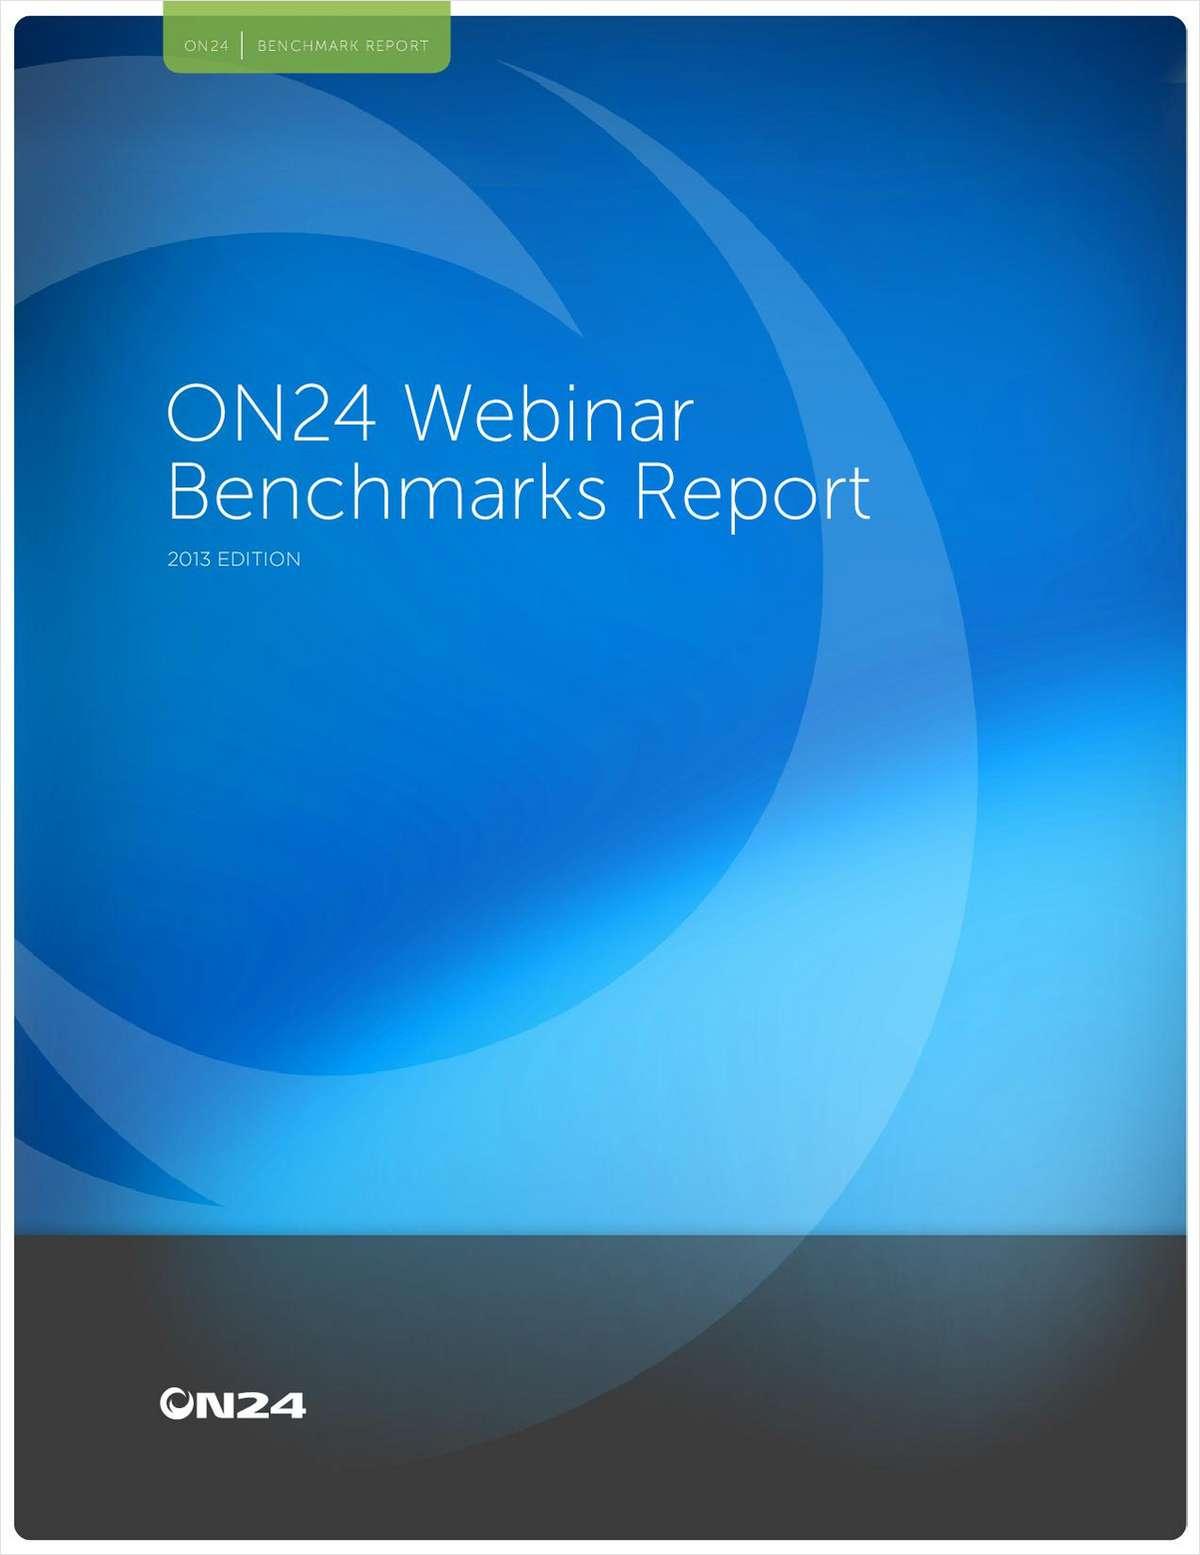 2013 Annual Webinar Benchmarks Report